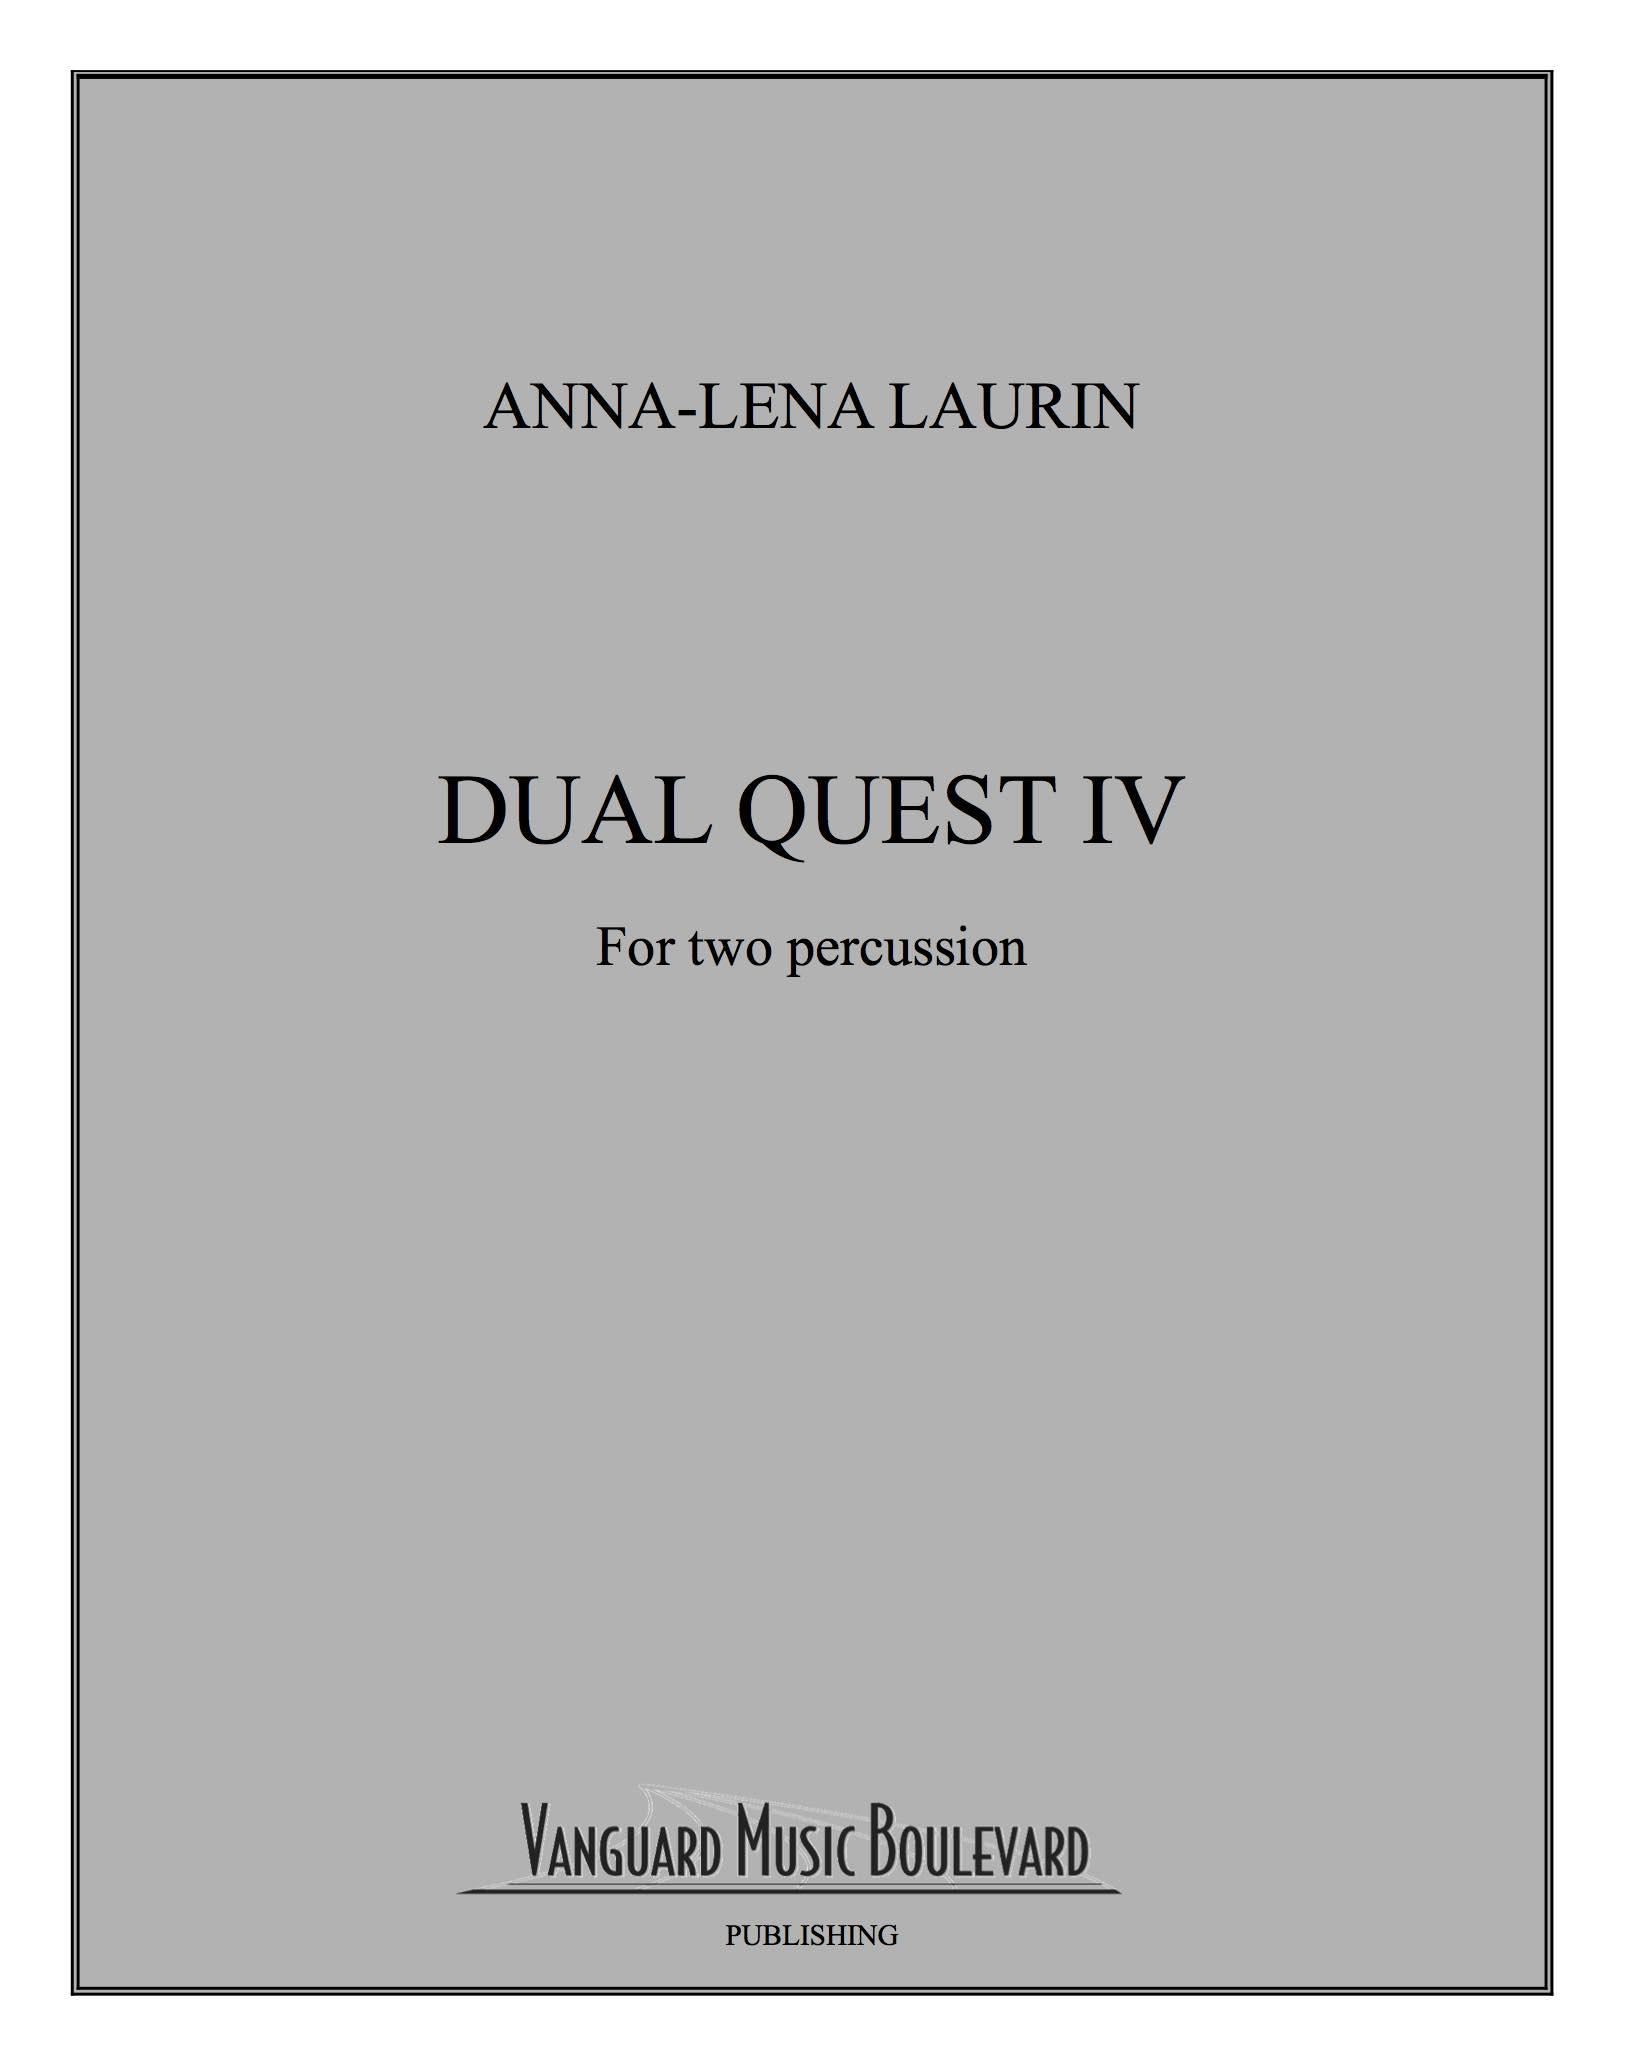 DUAL QUEST IV